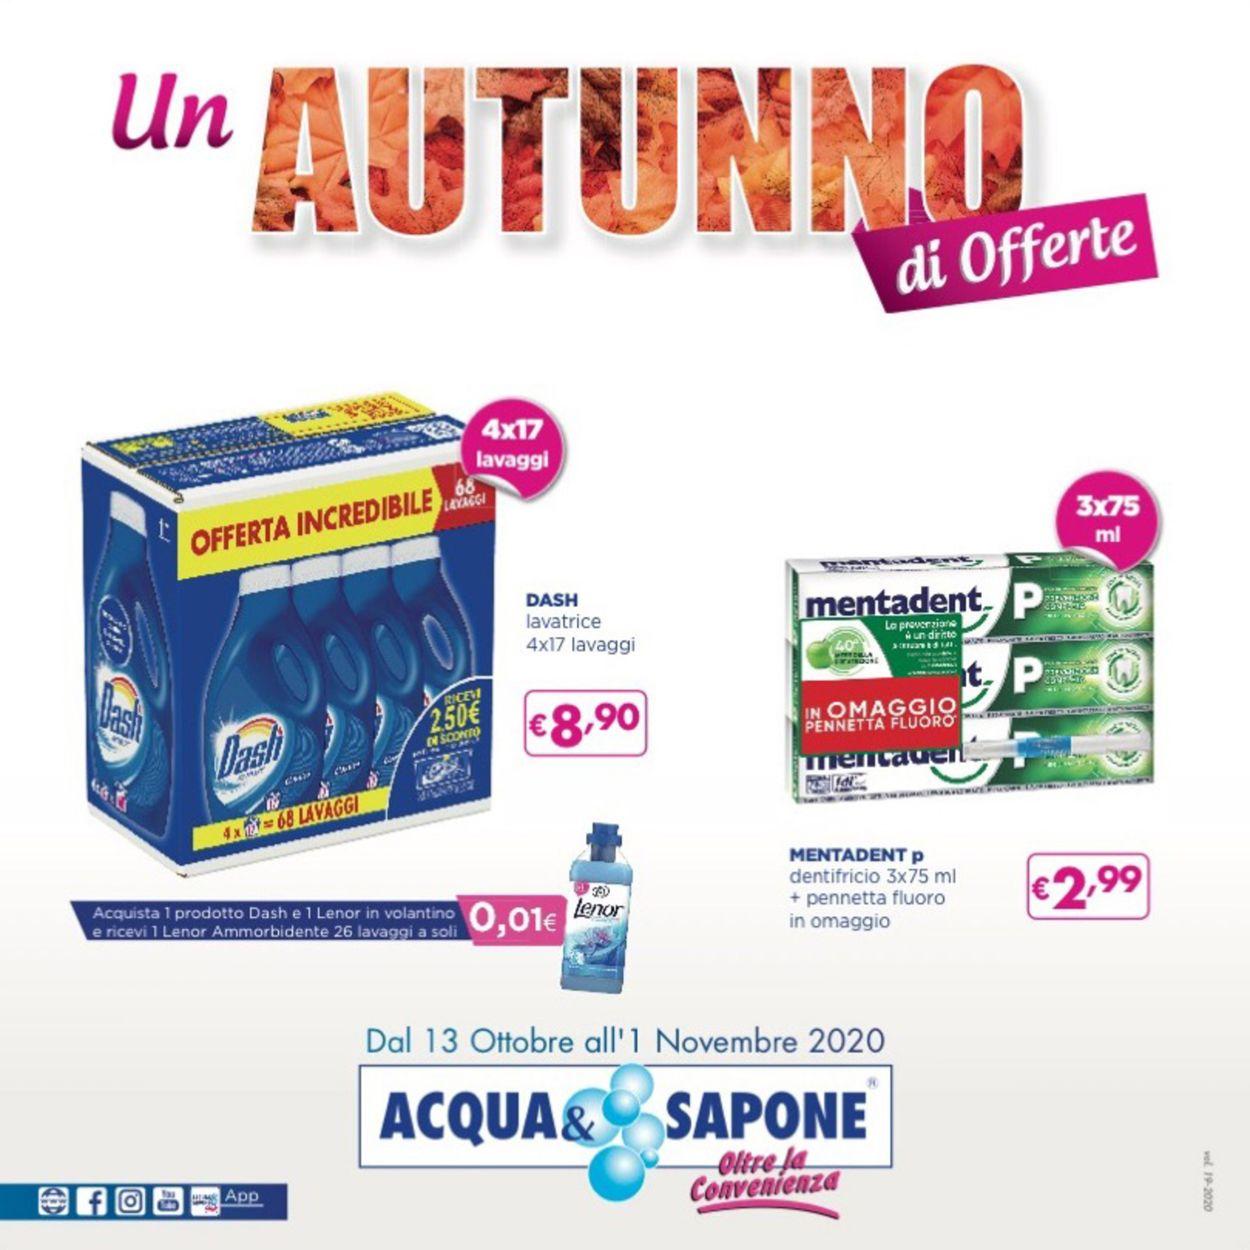 Volantino Acqua & Sapone - Offerte 13/10-01/11/2020